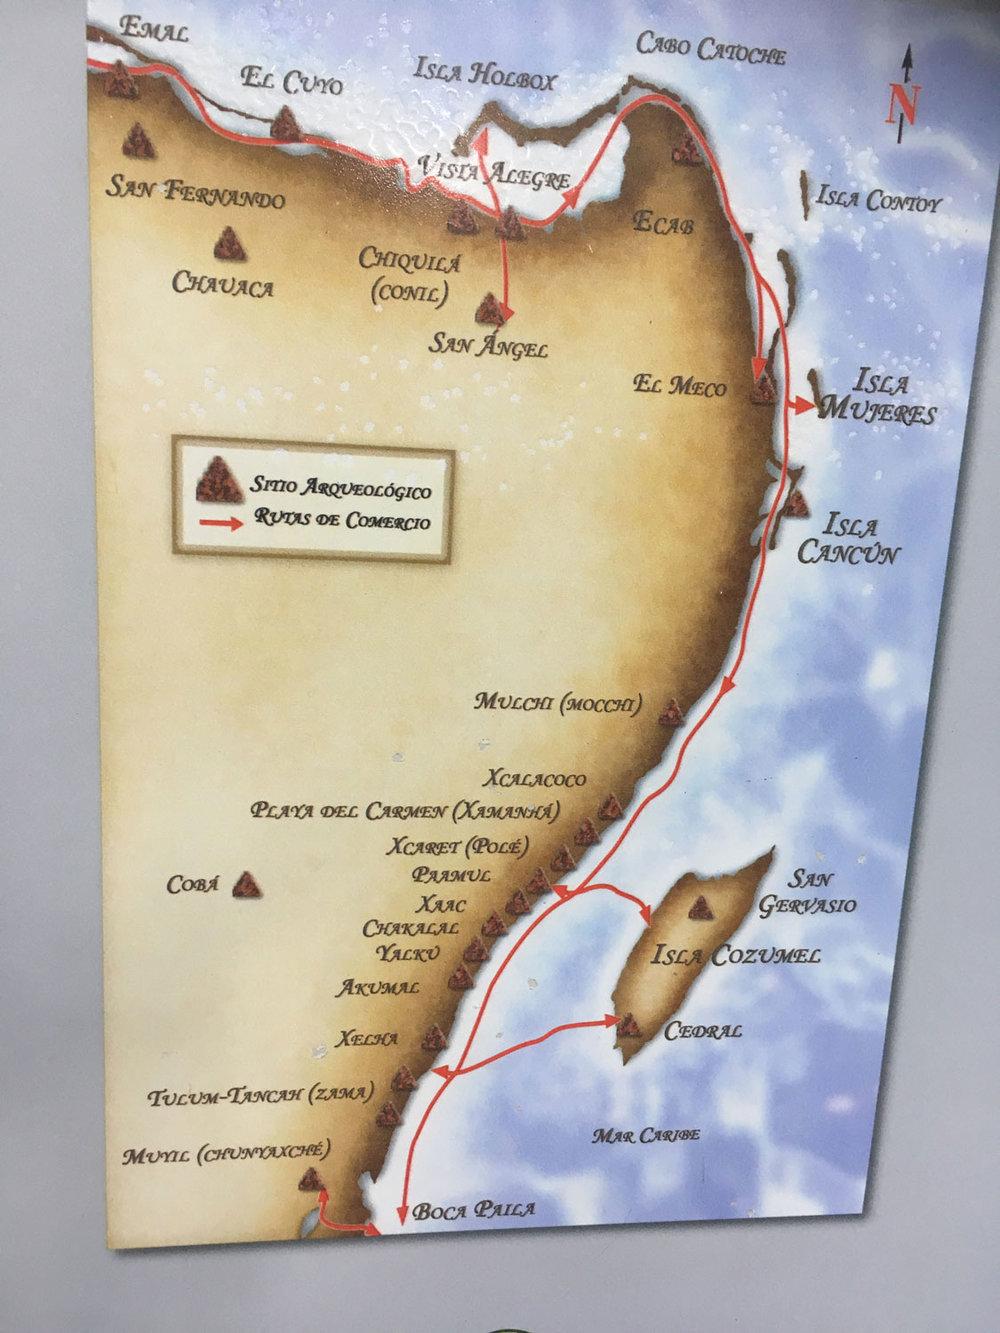 Hammocks_and_Ruins_Things_To_Do_Cancun_Explore_Riviera_Maya_Mexico_Cancun_Beaches_Ruins_El_Meco_17.jpg